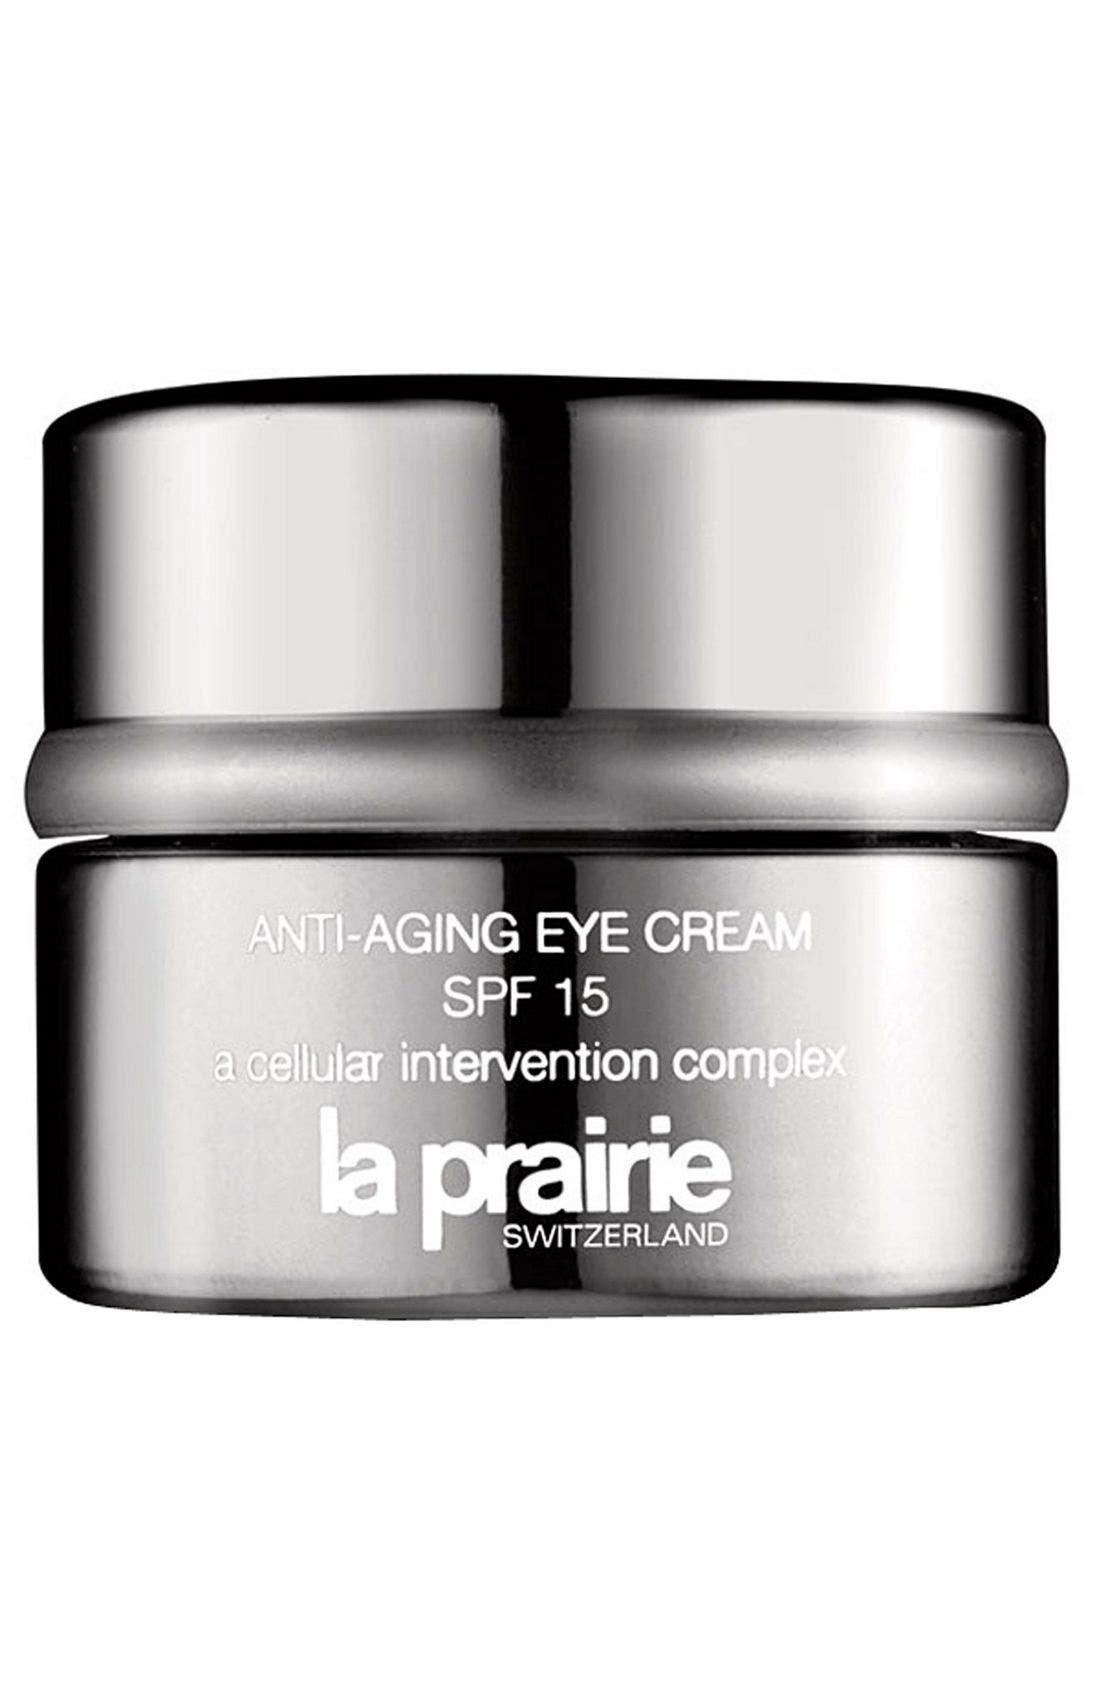 Anti-Aging Eye Cream Sunscreen Broad Spectrum SPF 15,                             Main thumbnail 1, color,                             NO COLOR